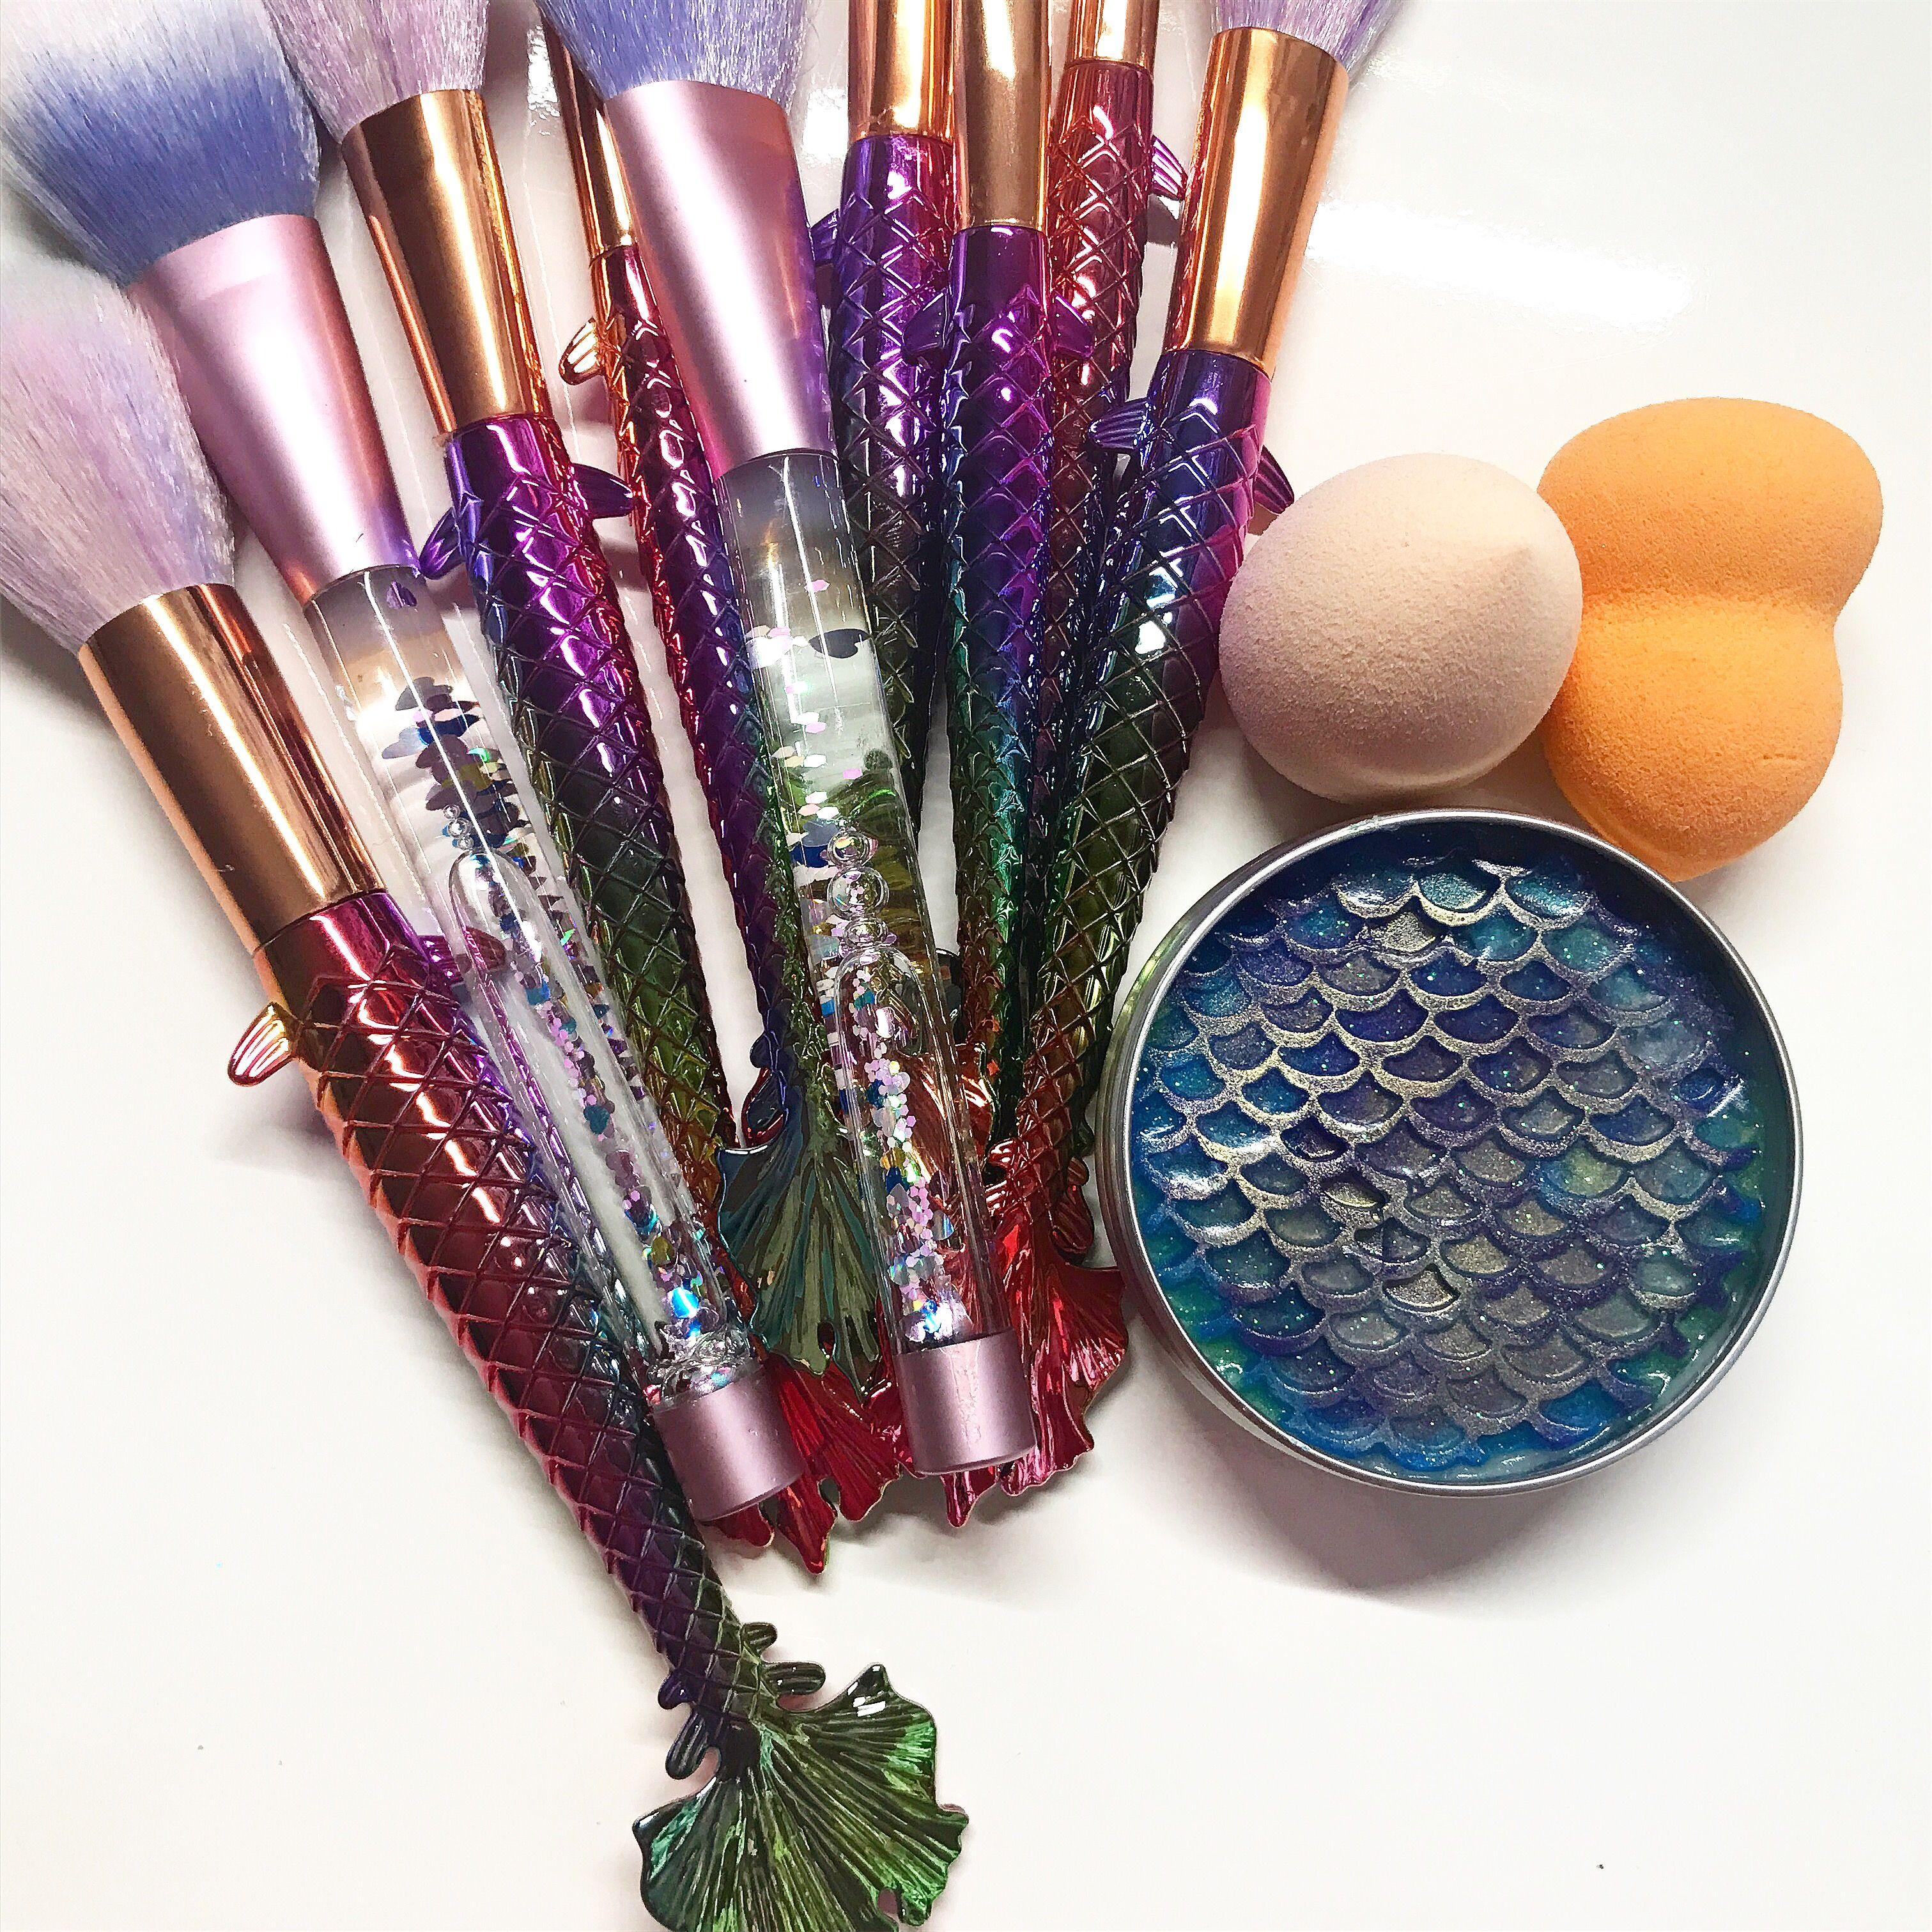 Solid brush cleaner. Makeup brush soap Makeup brushes